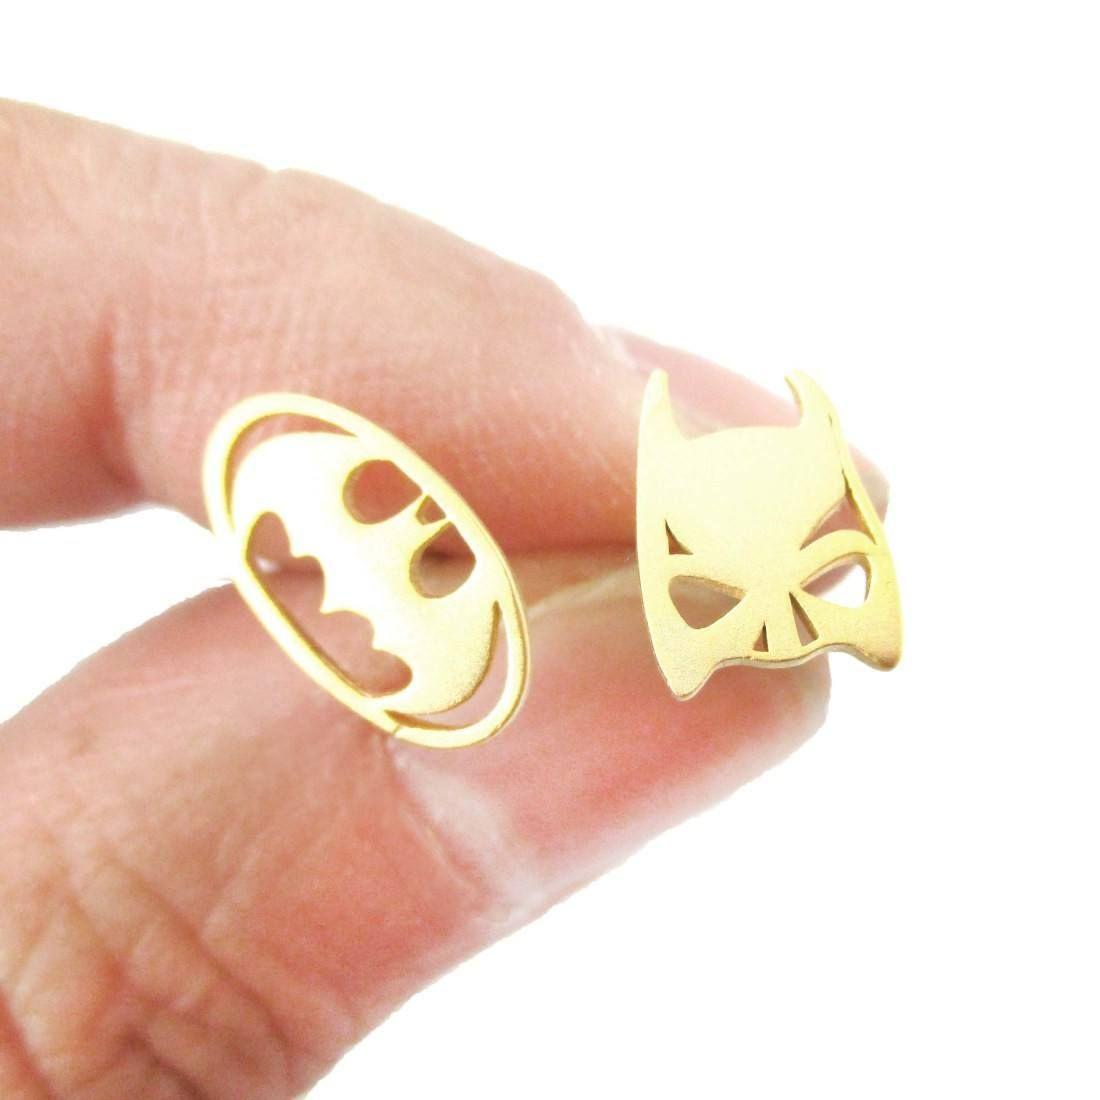 af009b966ecbd Batman Logo Symbol and Bat Mask Shaped Stud Earrings in Gold ...